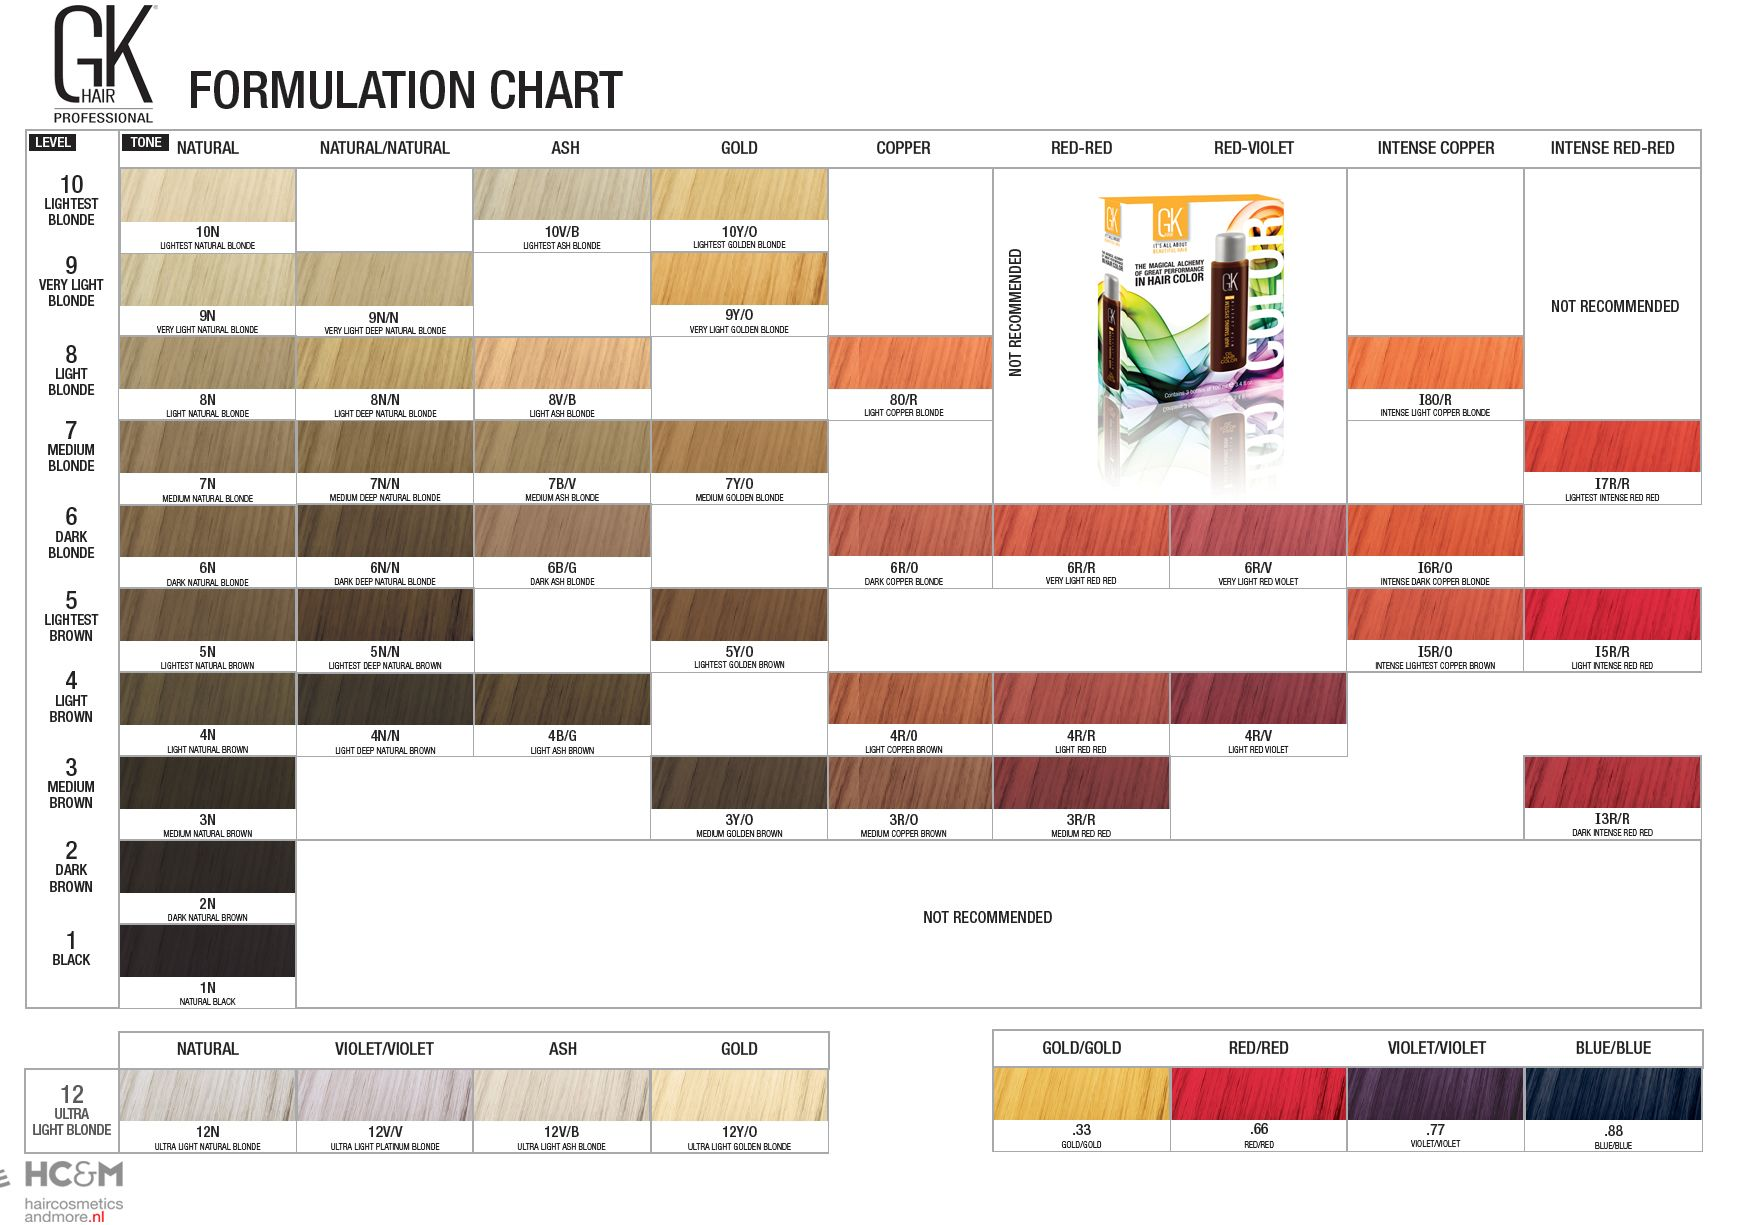 Gk Hair Formulation Chart